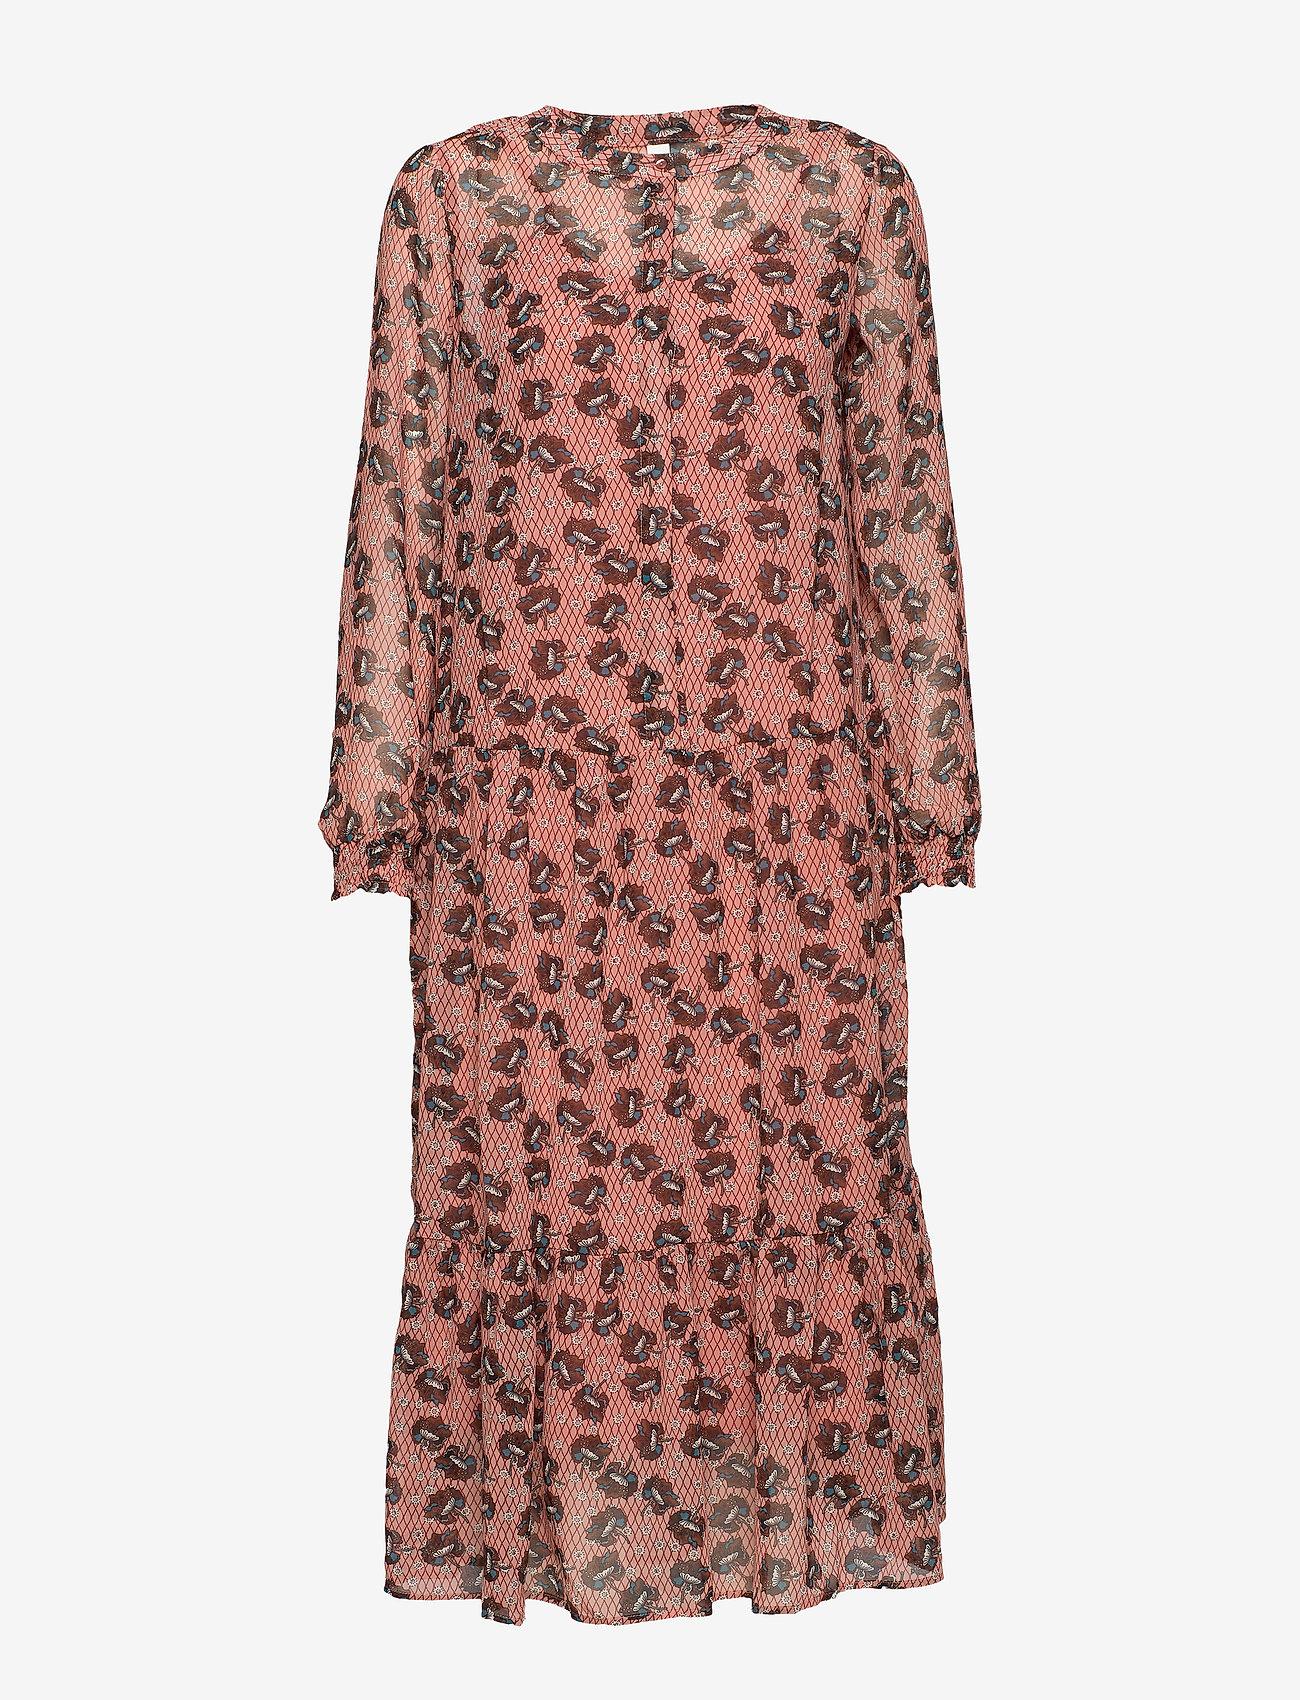 Soyaconcept - SC-BLONDIE - robes longeur du midi - rose smoke combi